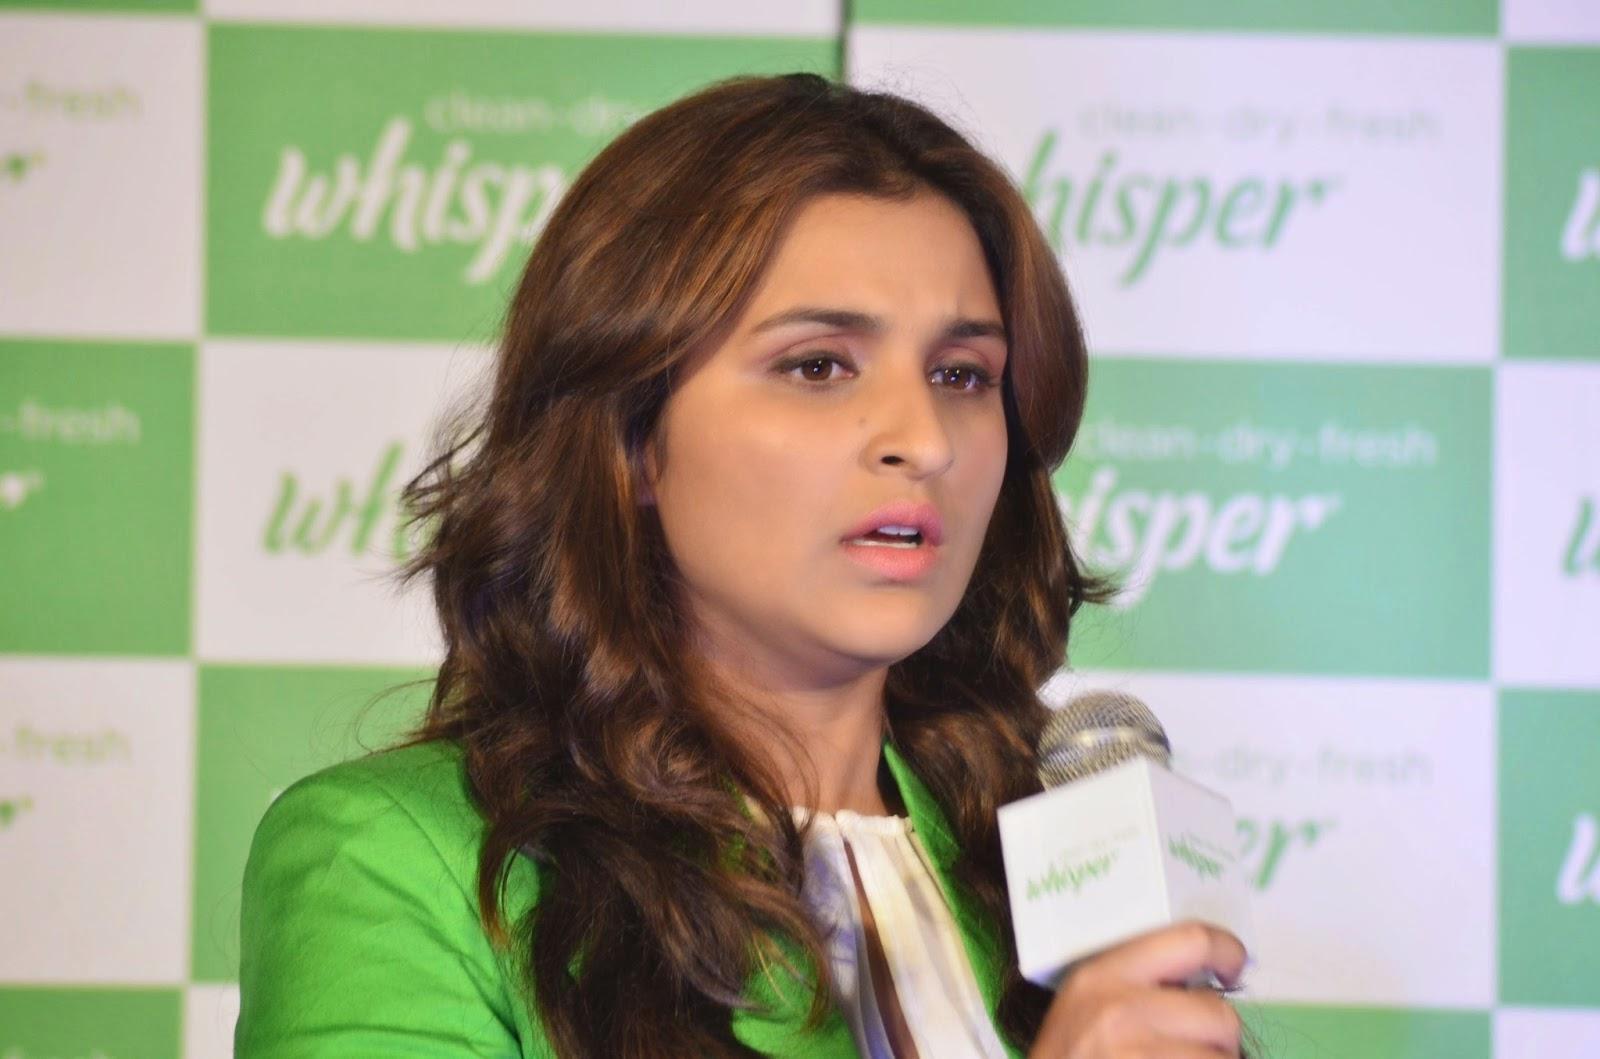 Actress Parineeti Chopra unveils the all new Whisper campaign